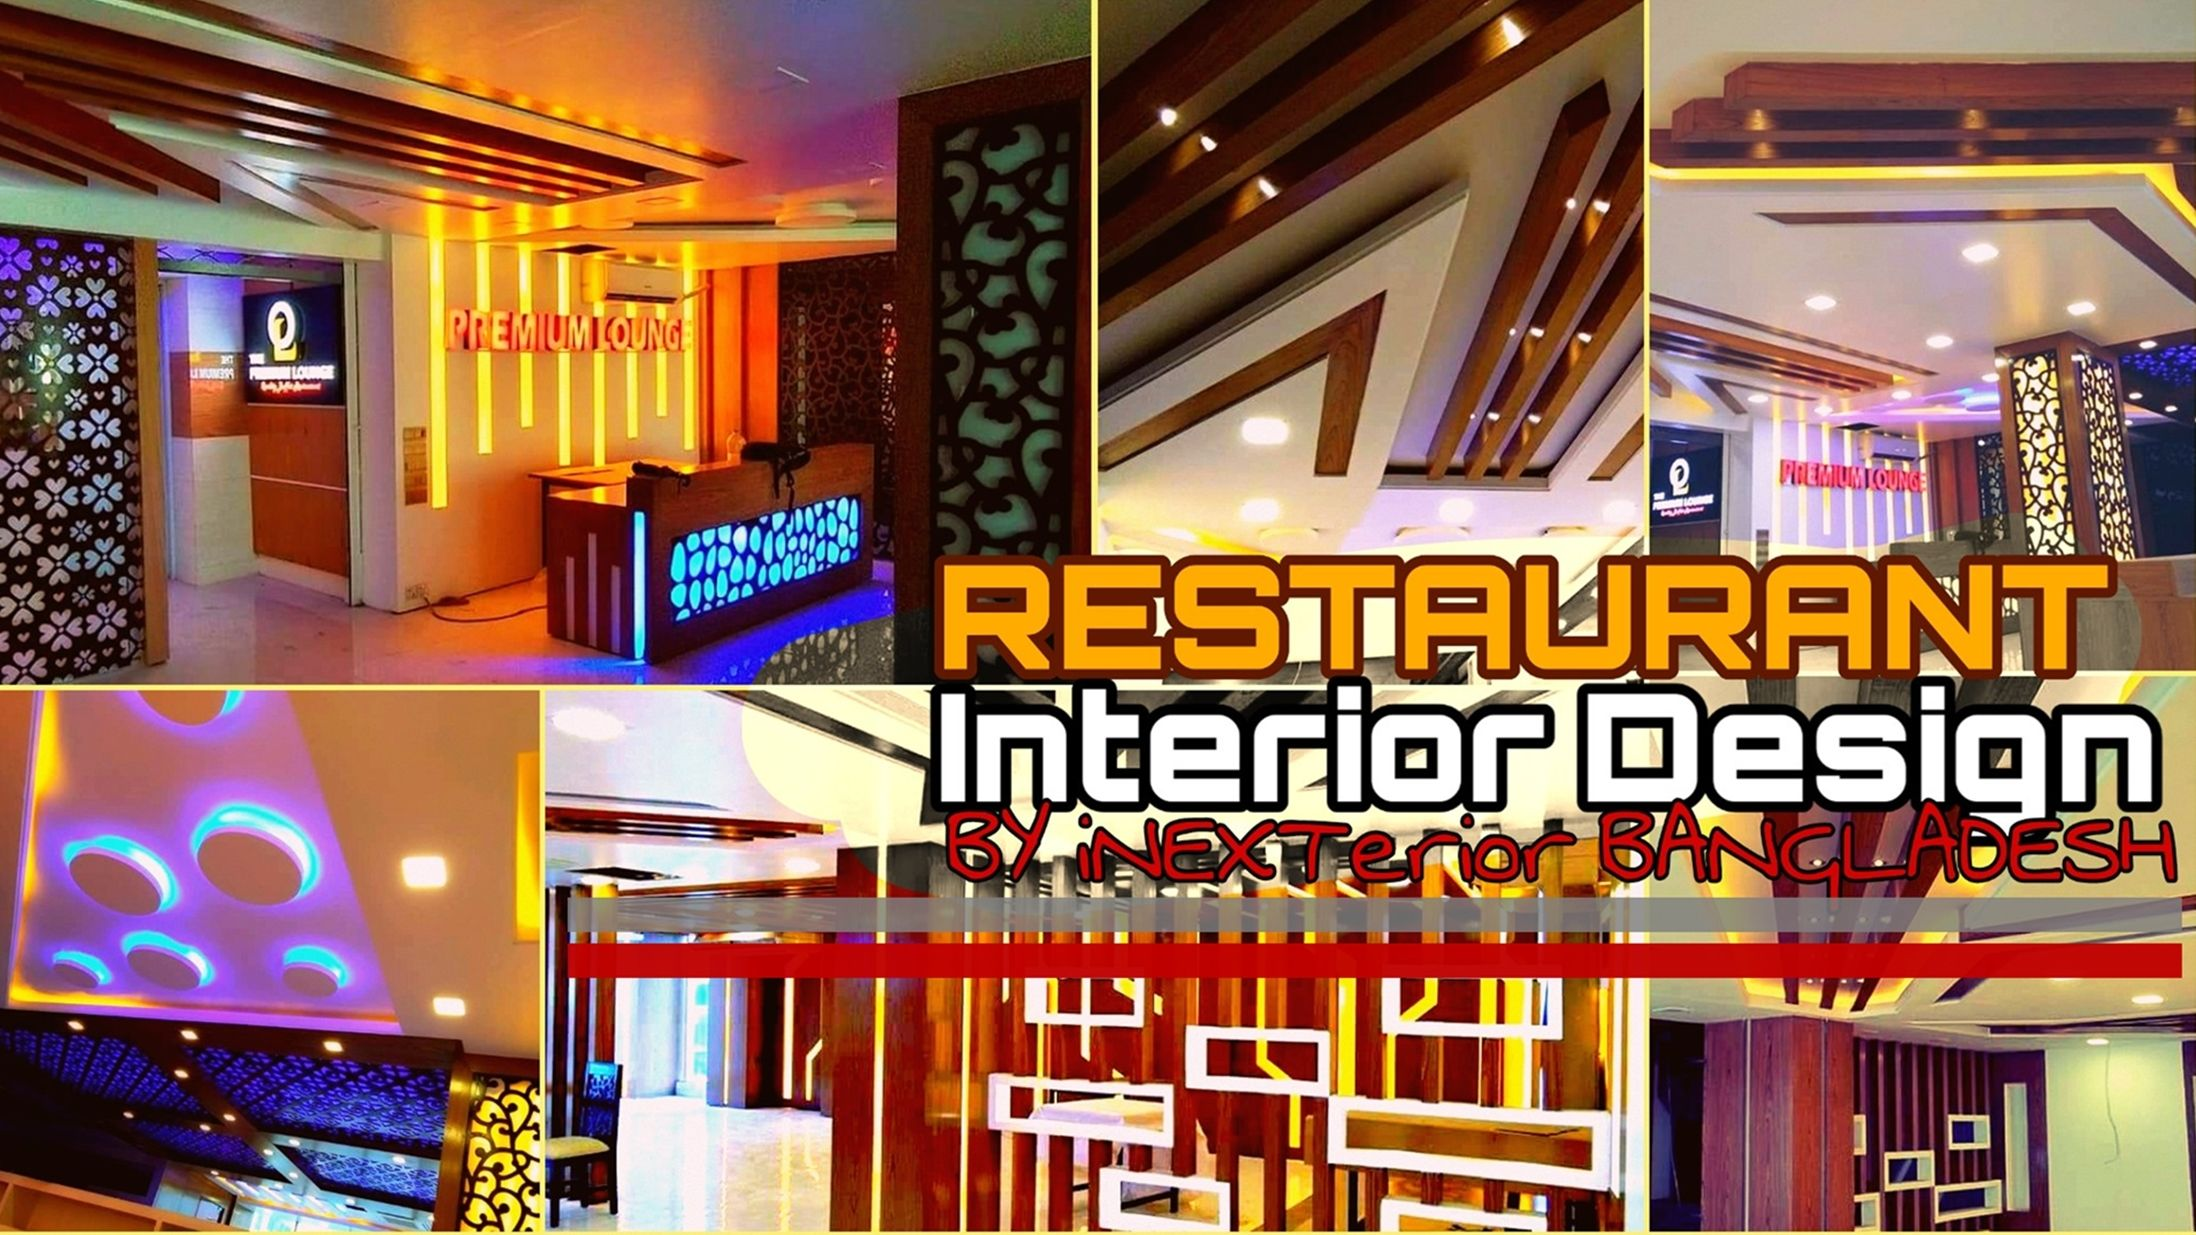 Inexterior Interior Exterior Design Company Dhaka Bangladesh Restaurant Interior Design Top Interior Design Firms Cafe Interior Design